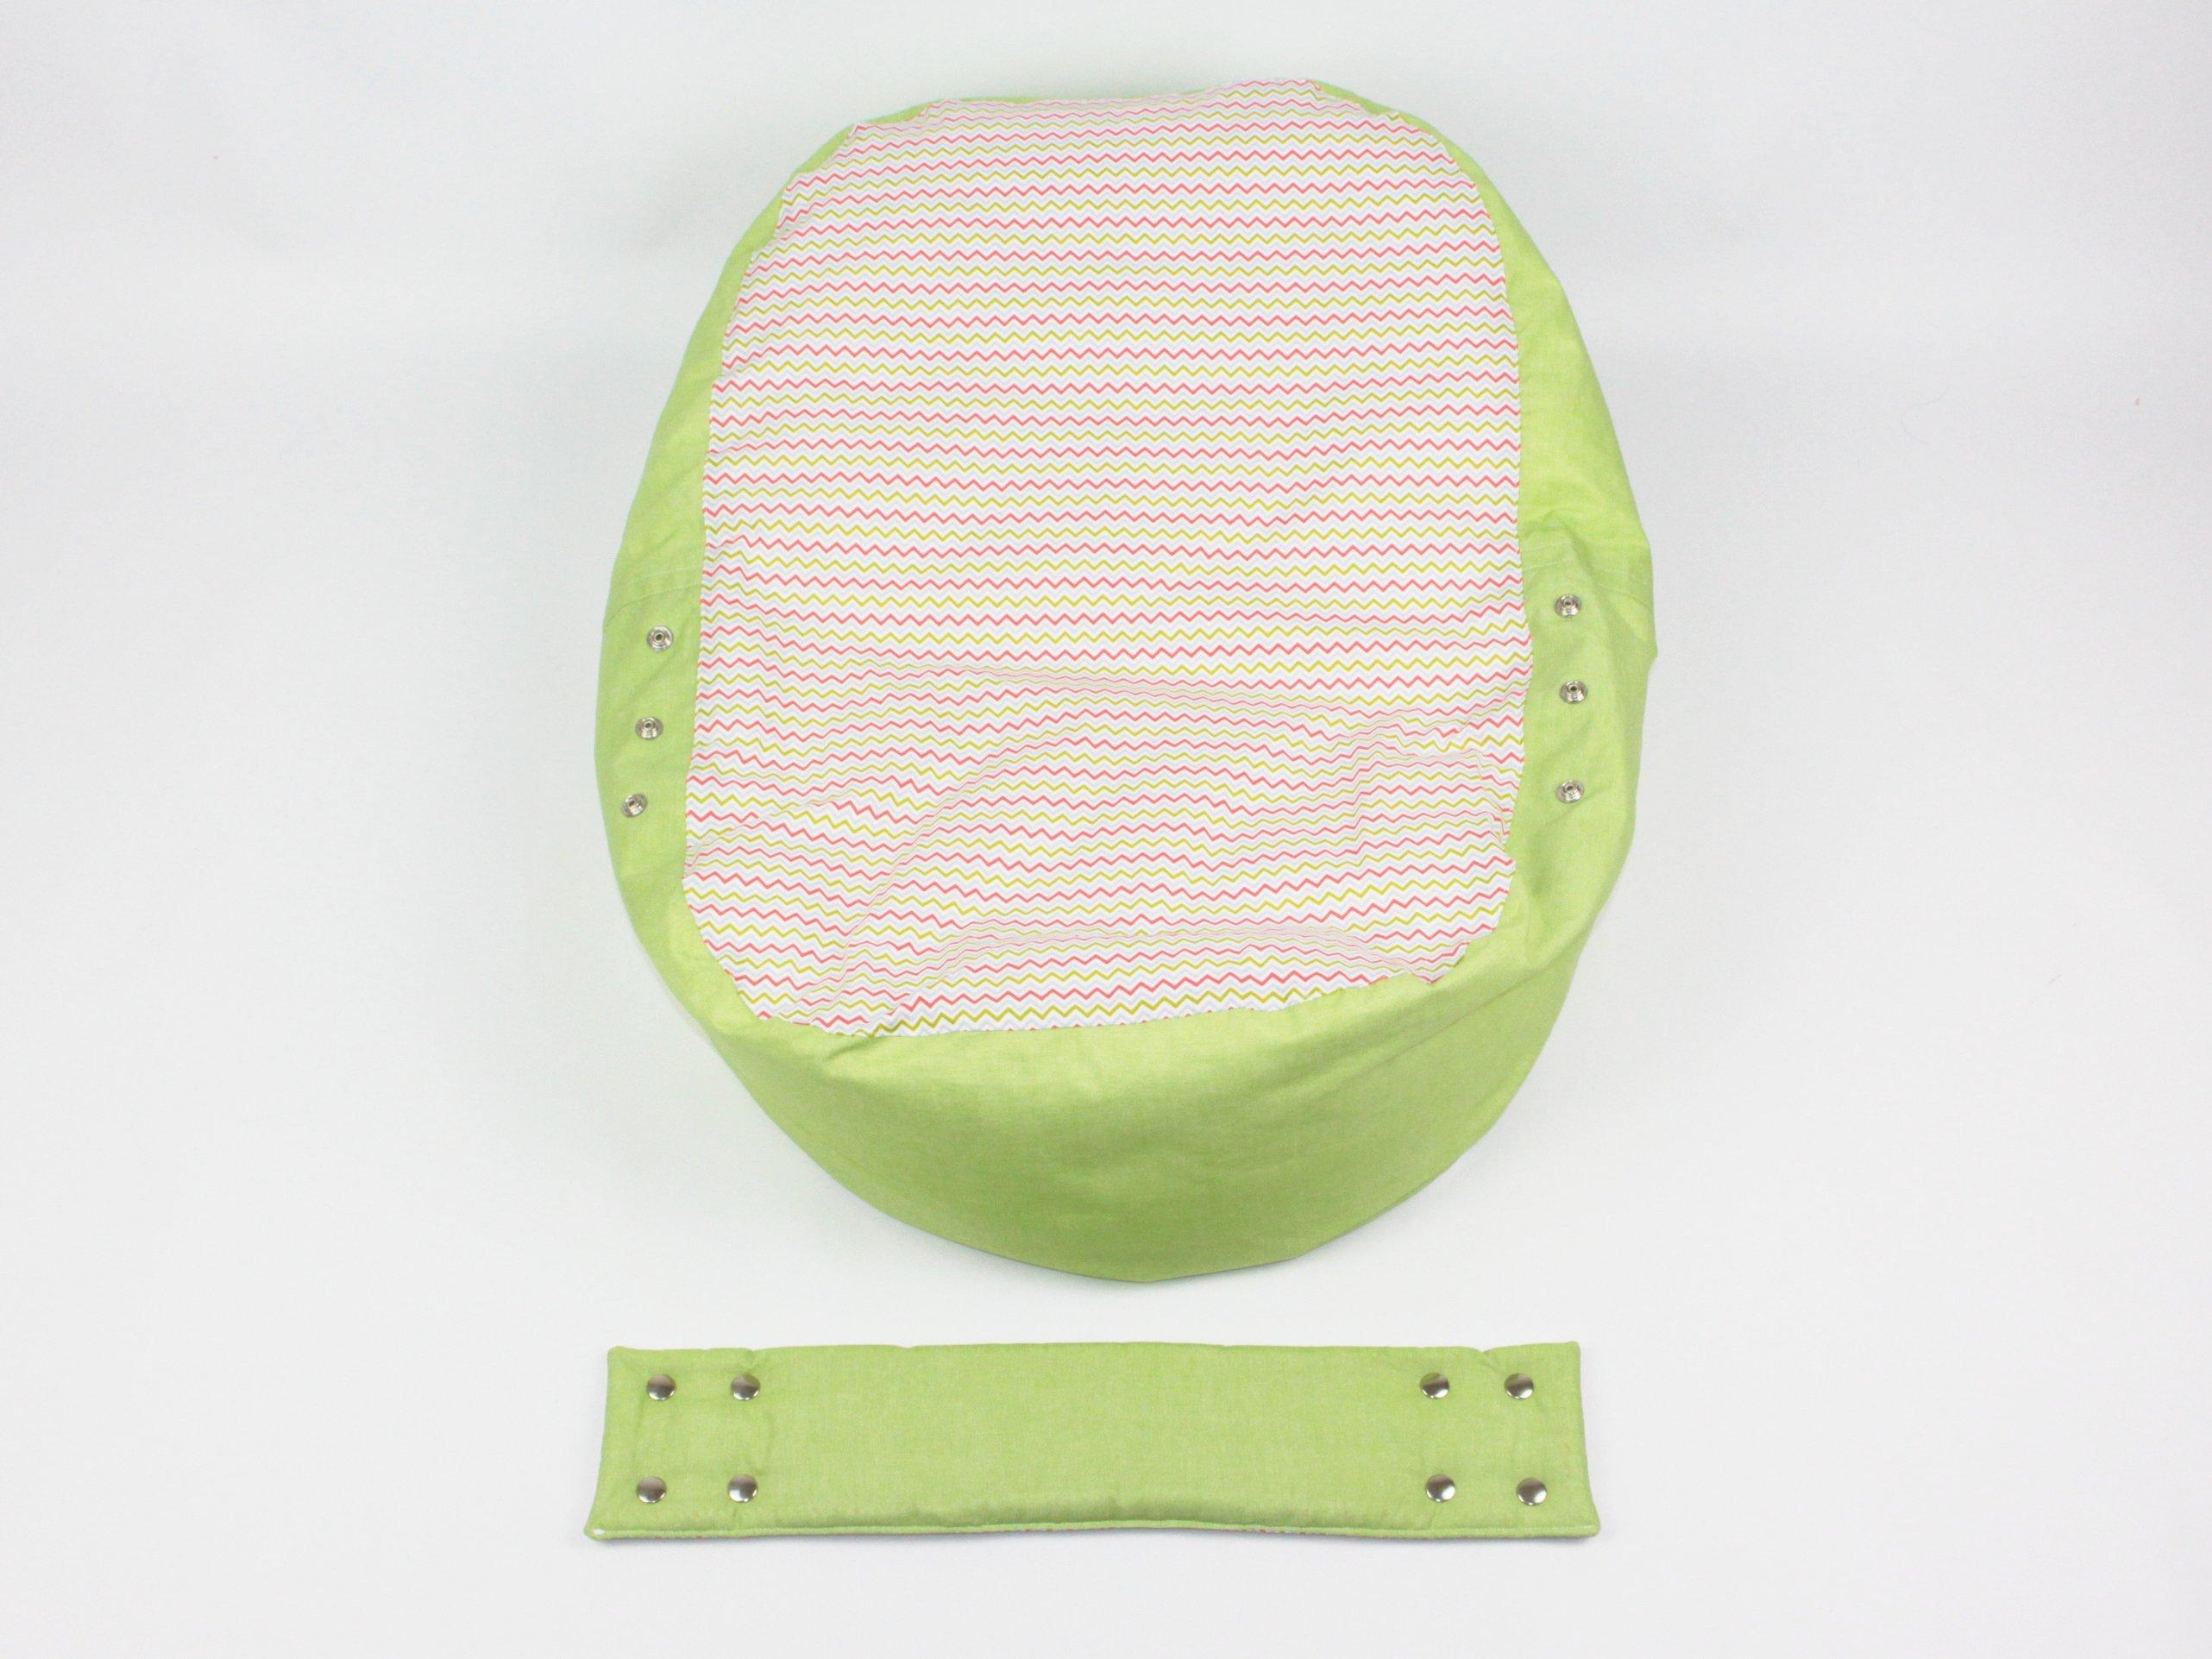 Liegekissen grün Wellen 5